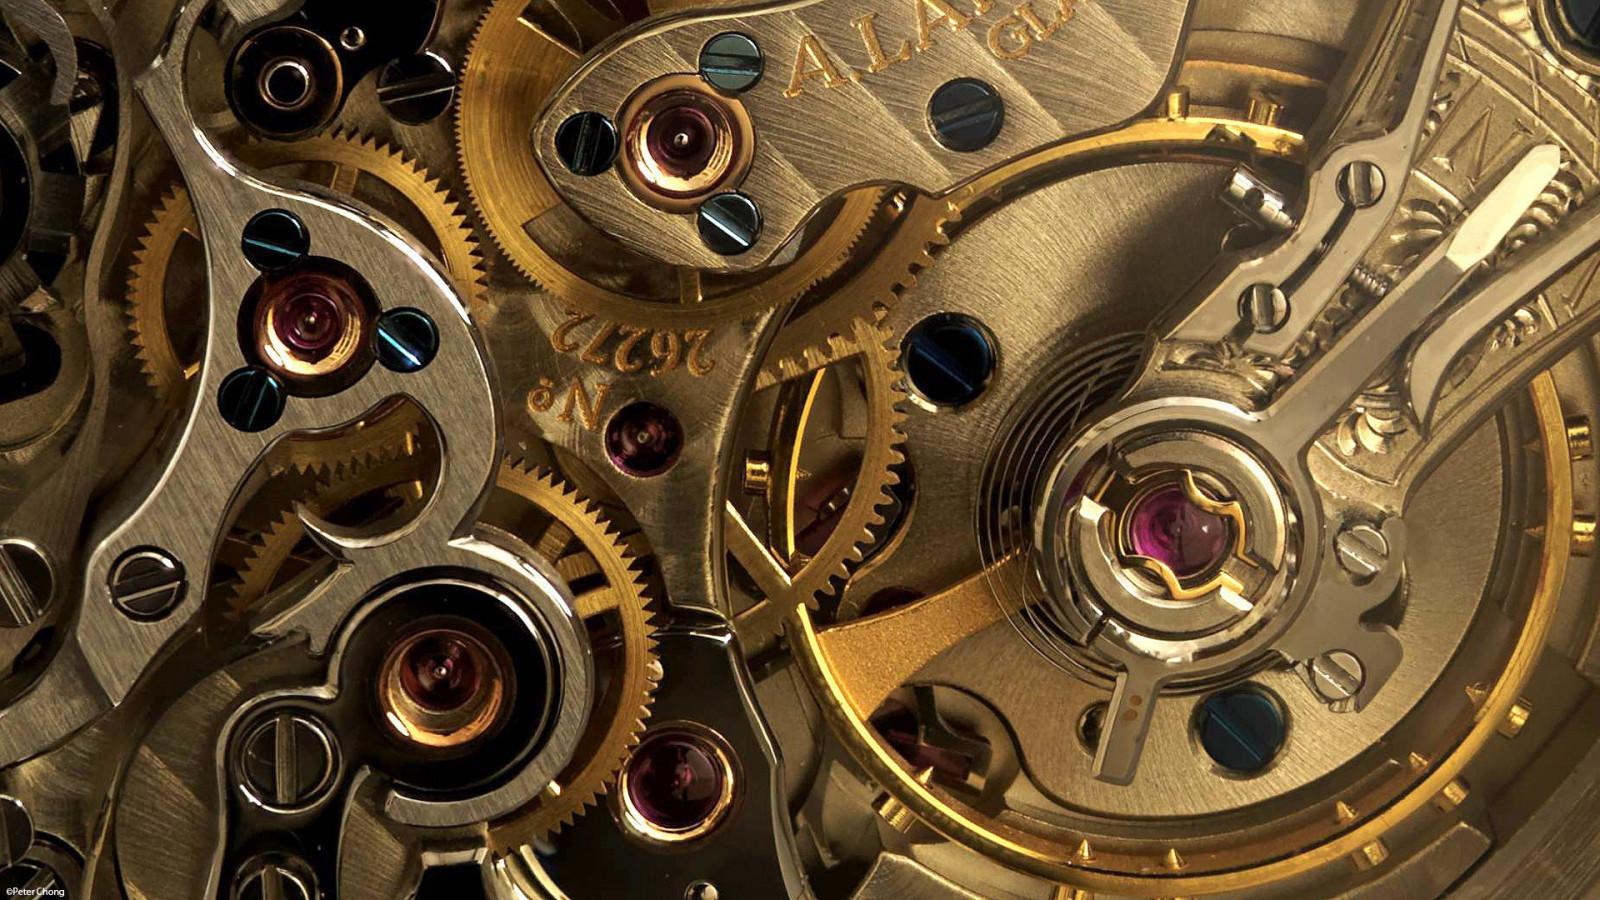 Wallpaper  photography clockwork clocks circle gold gear wheel rim 1920x1080 px